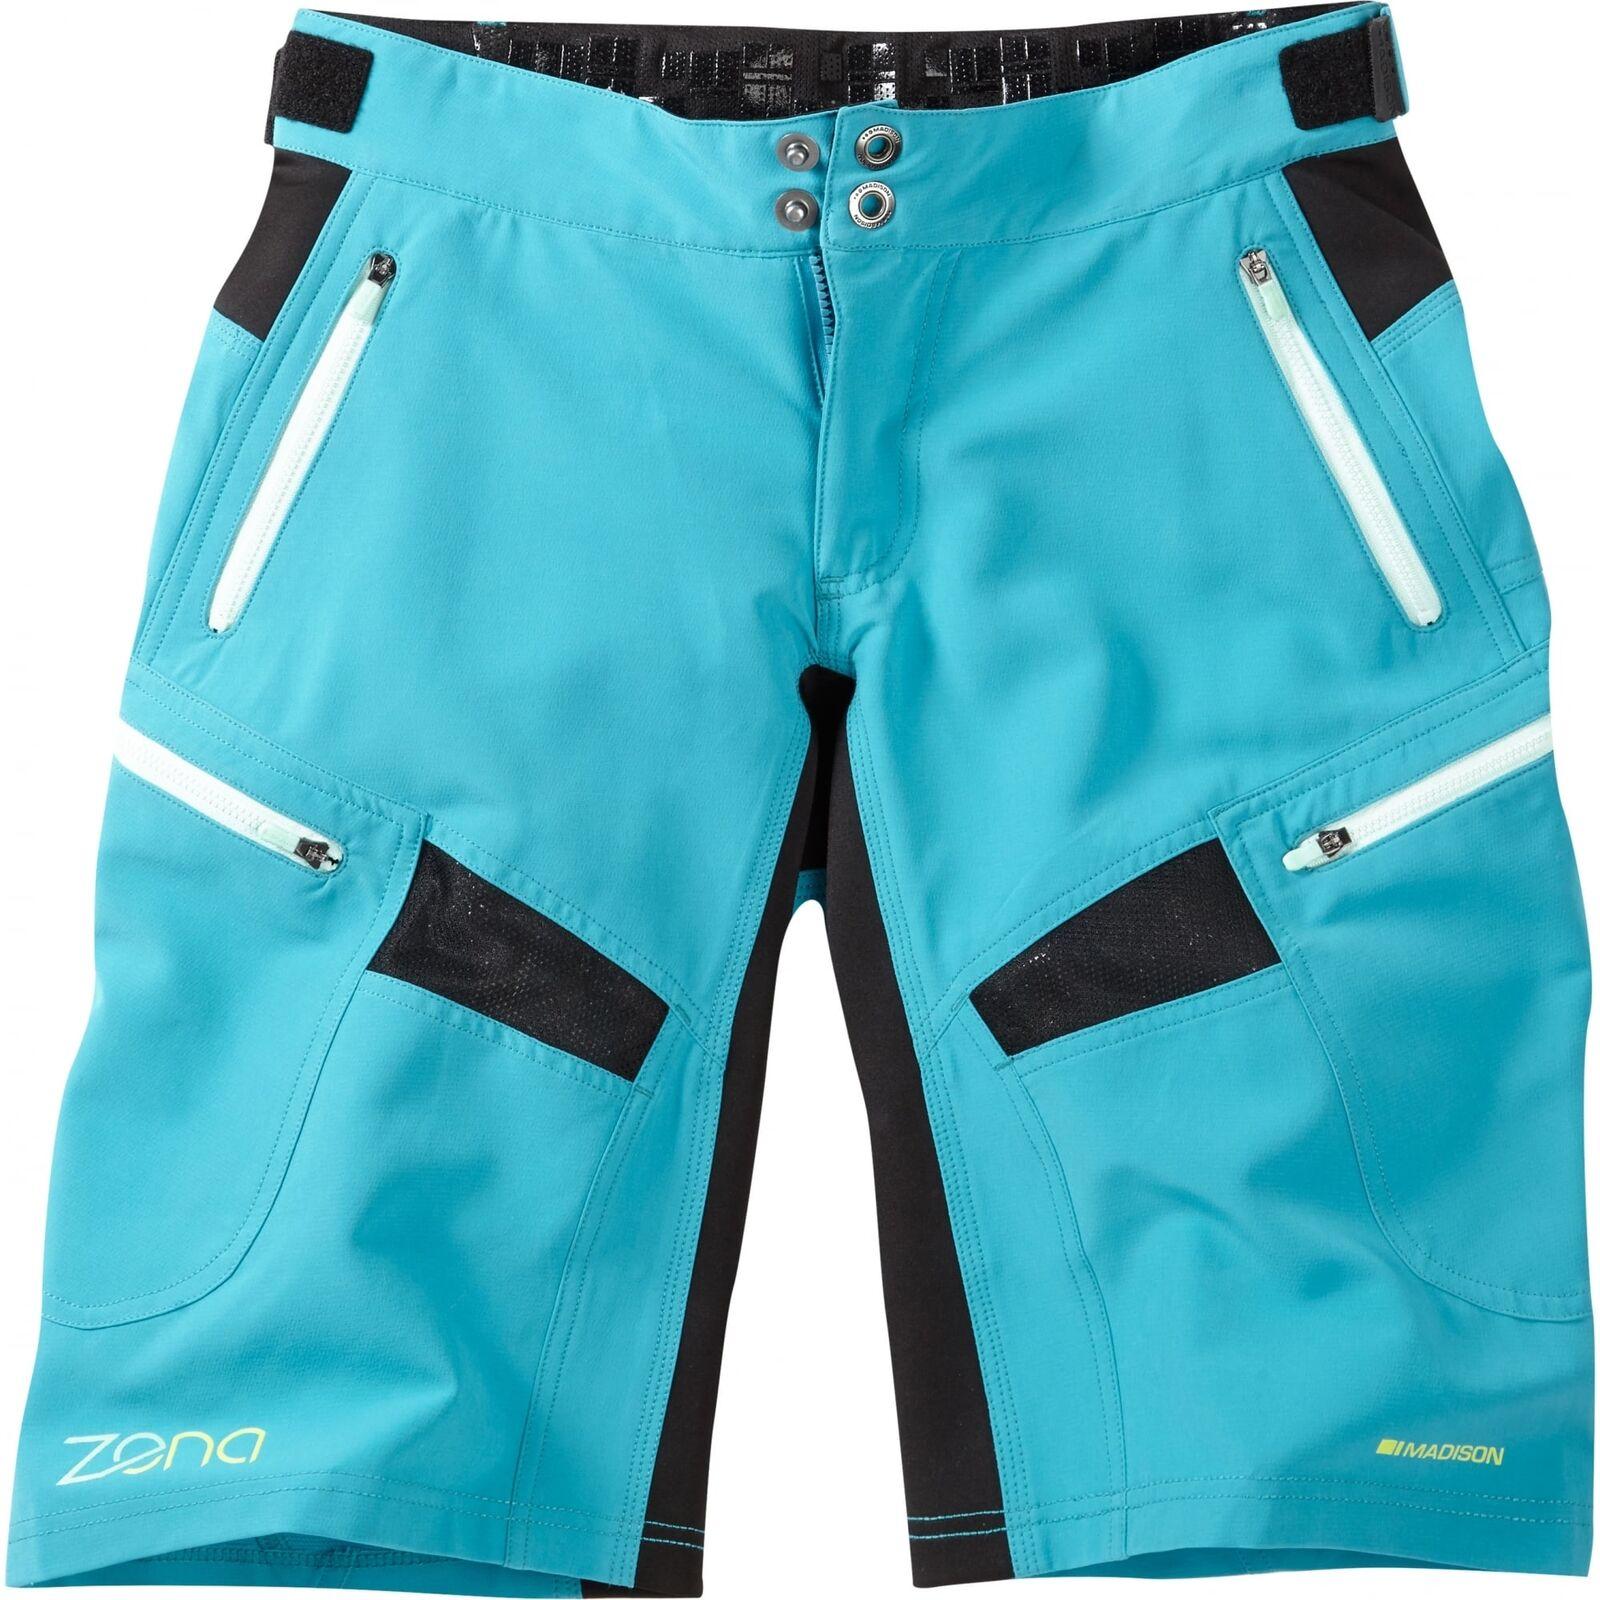 Madison  Madison Zena Women's Shorts  fast delivery